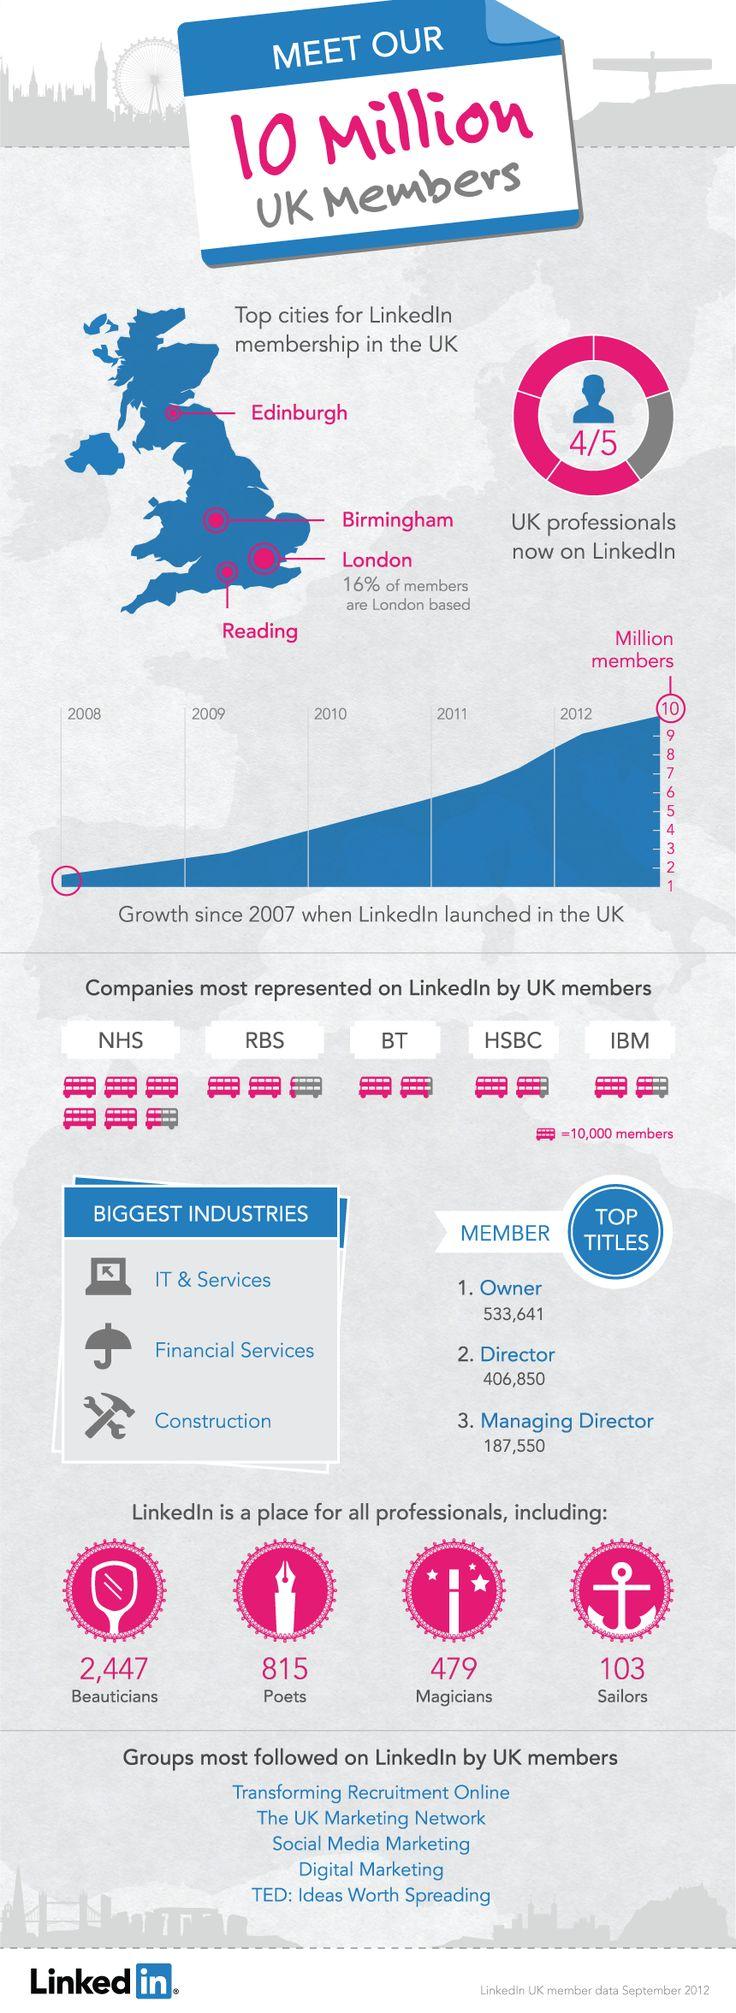 LinkedIn hits 10million users in UK